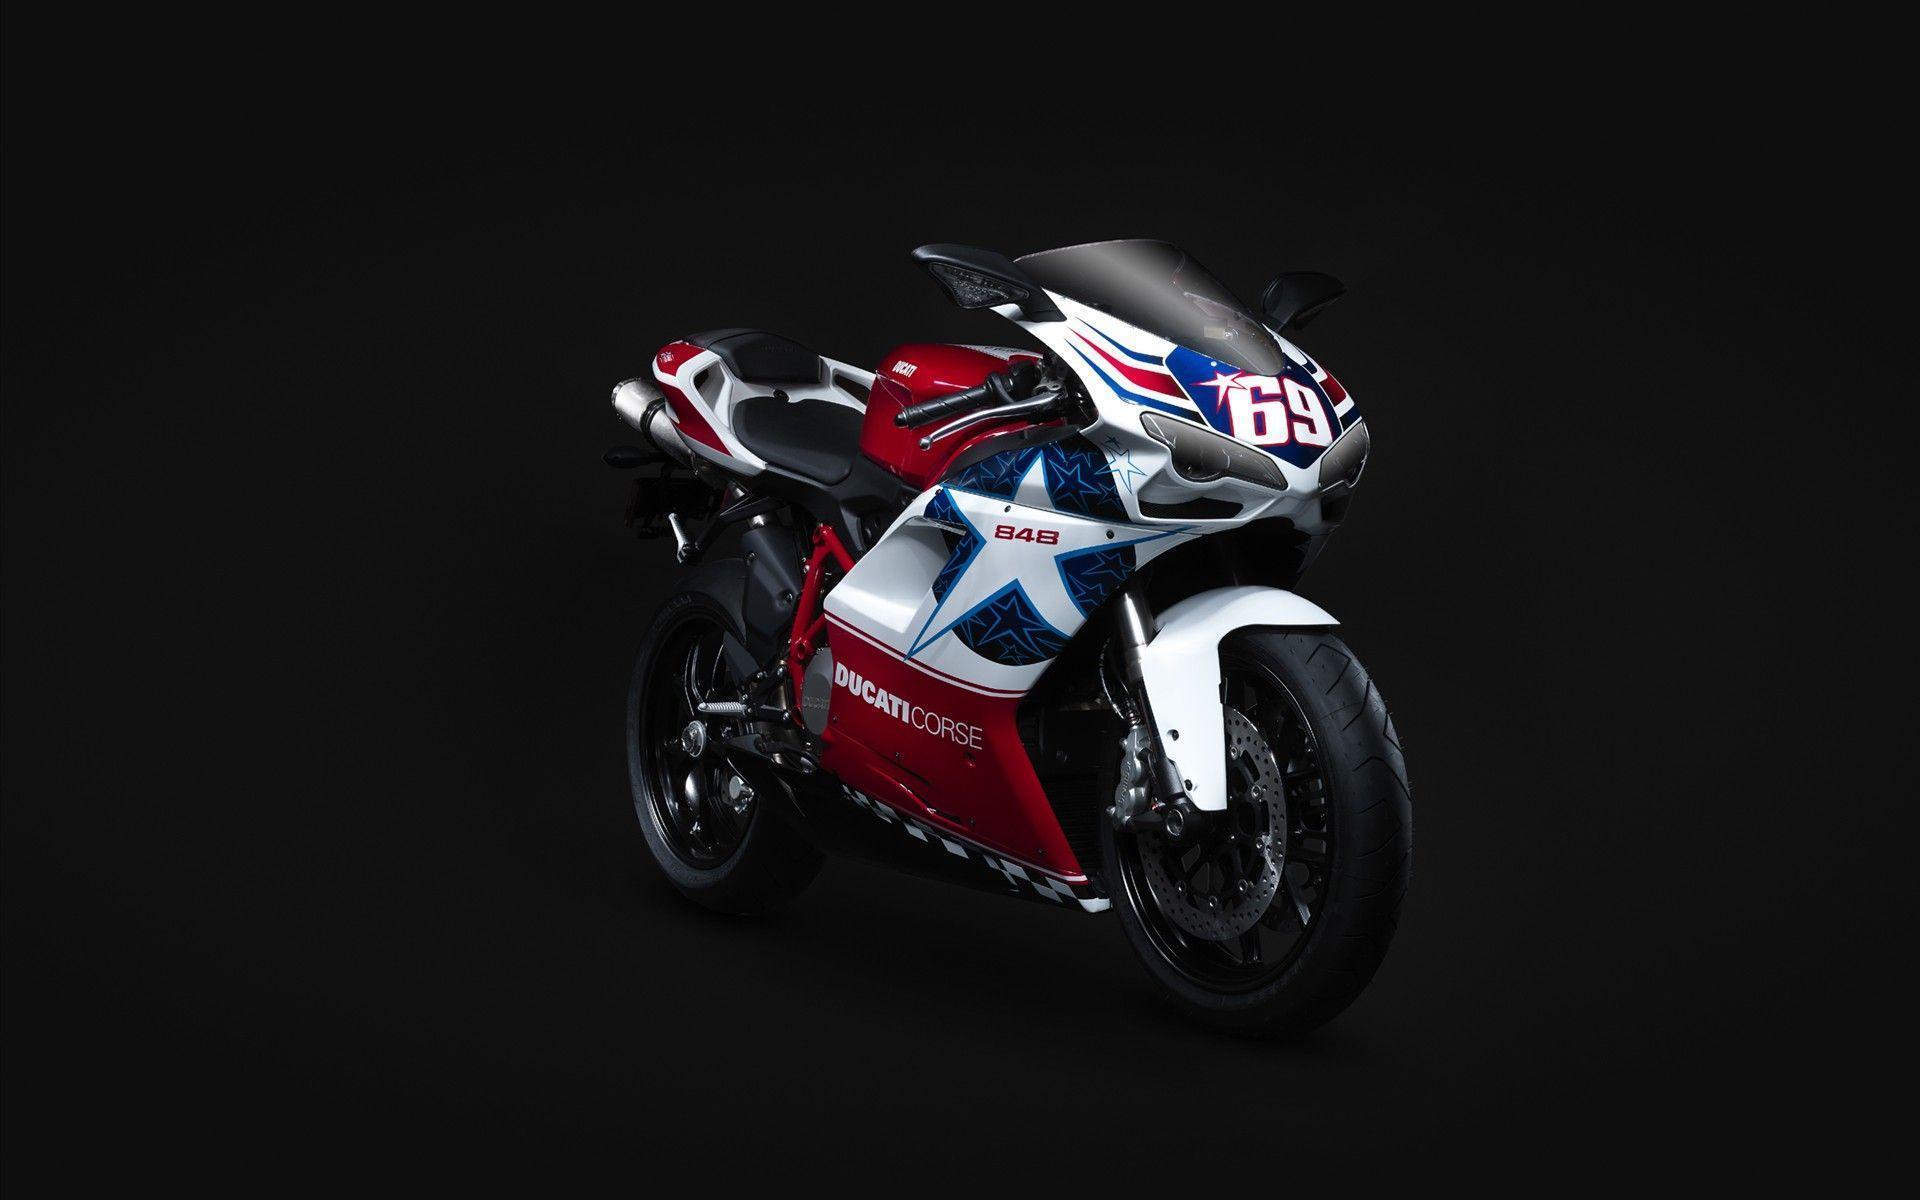 Ducati Bike Picture